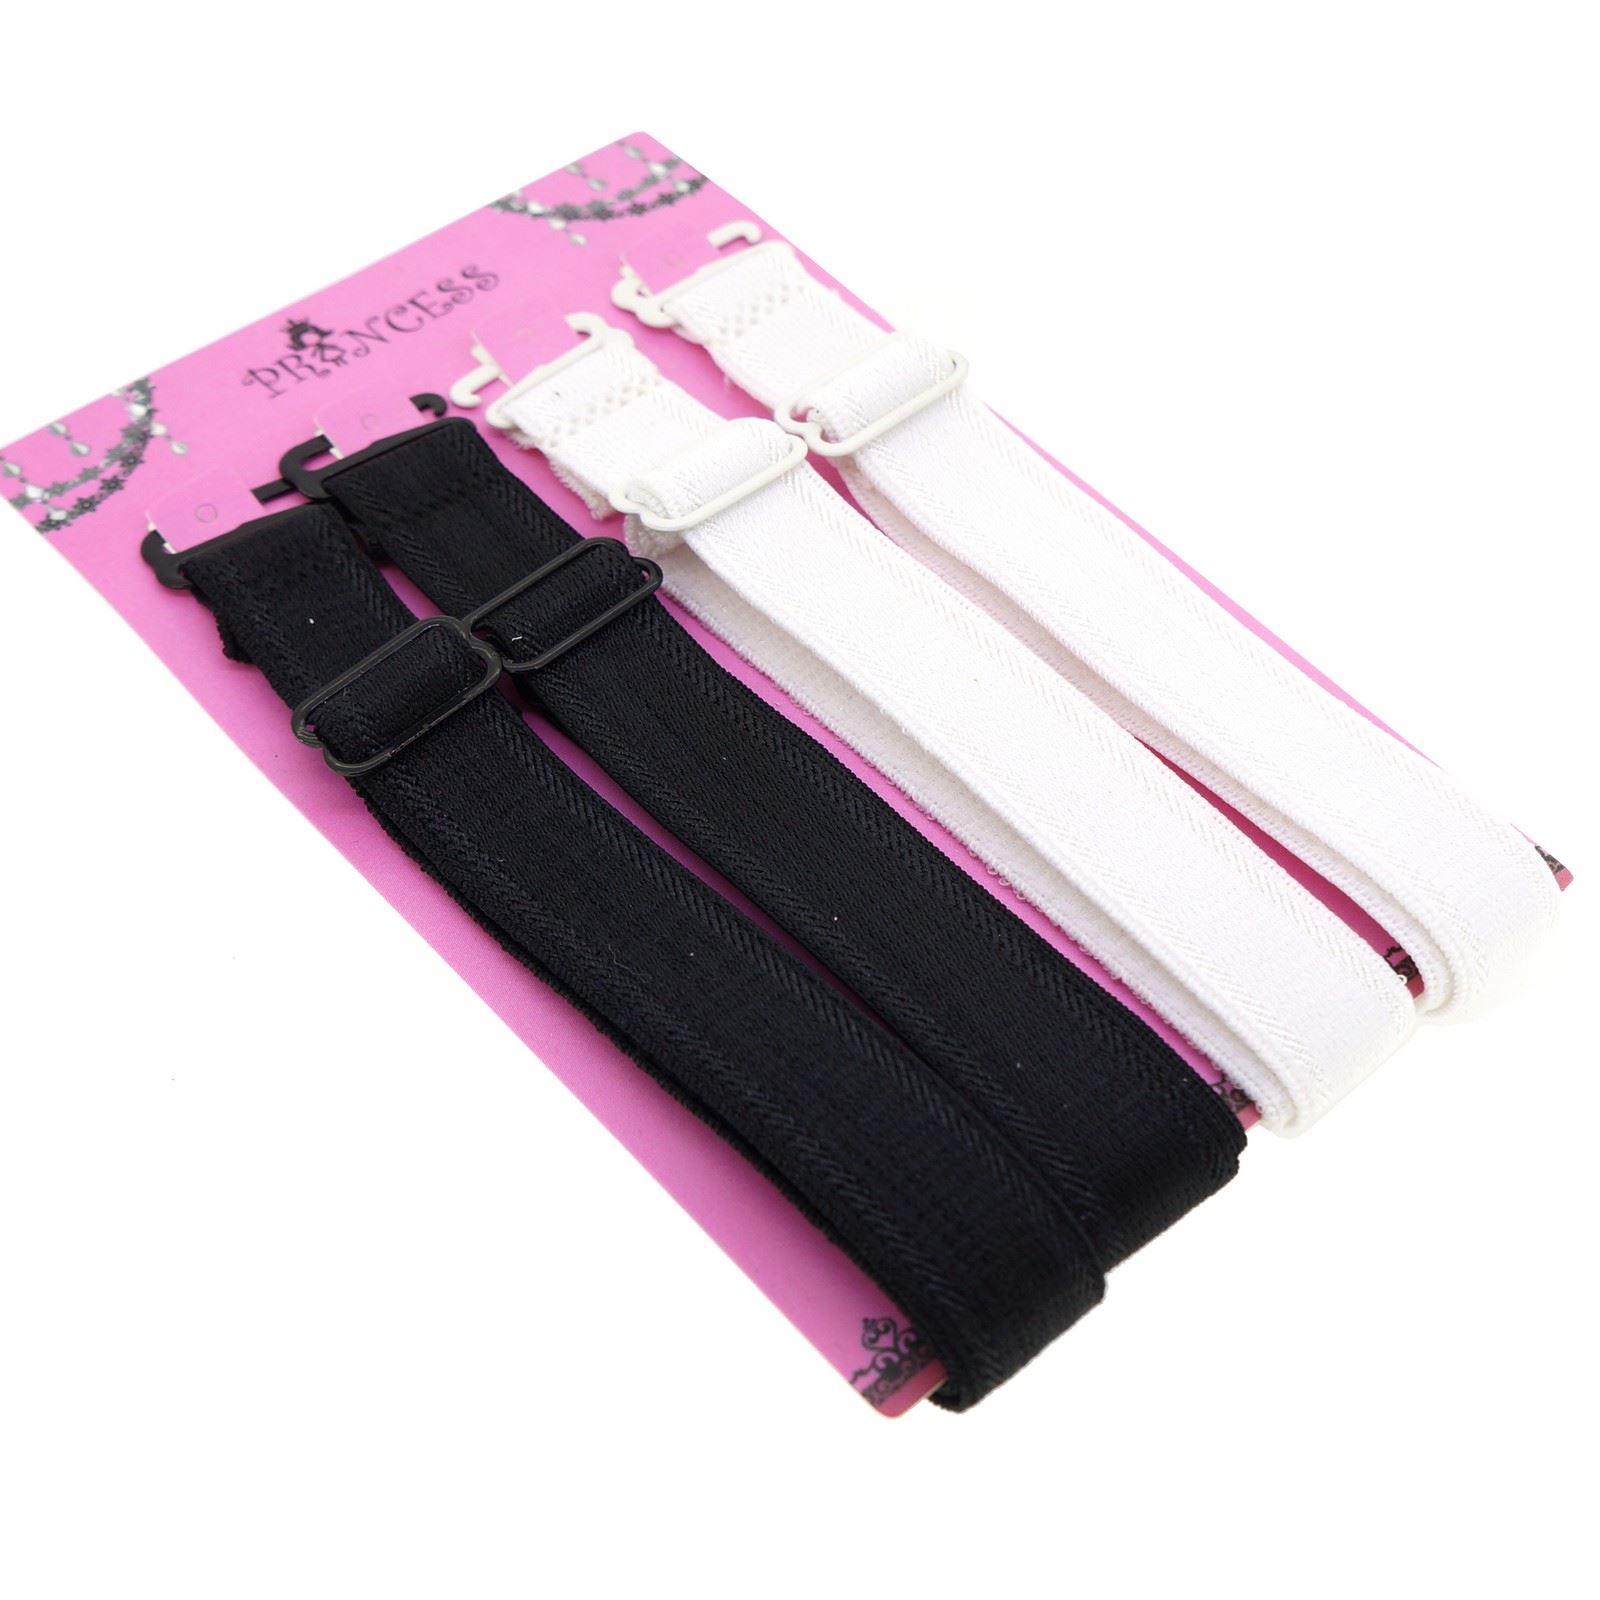 15mm Wide Band Fashion Stylish Bra Straps Women's Accessories Multi Color Set